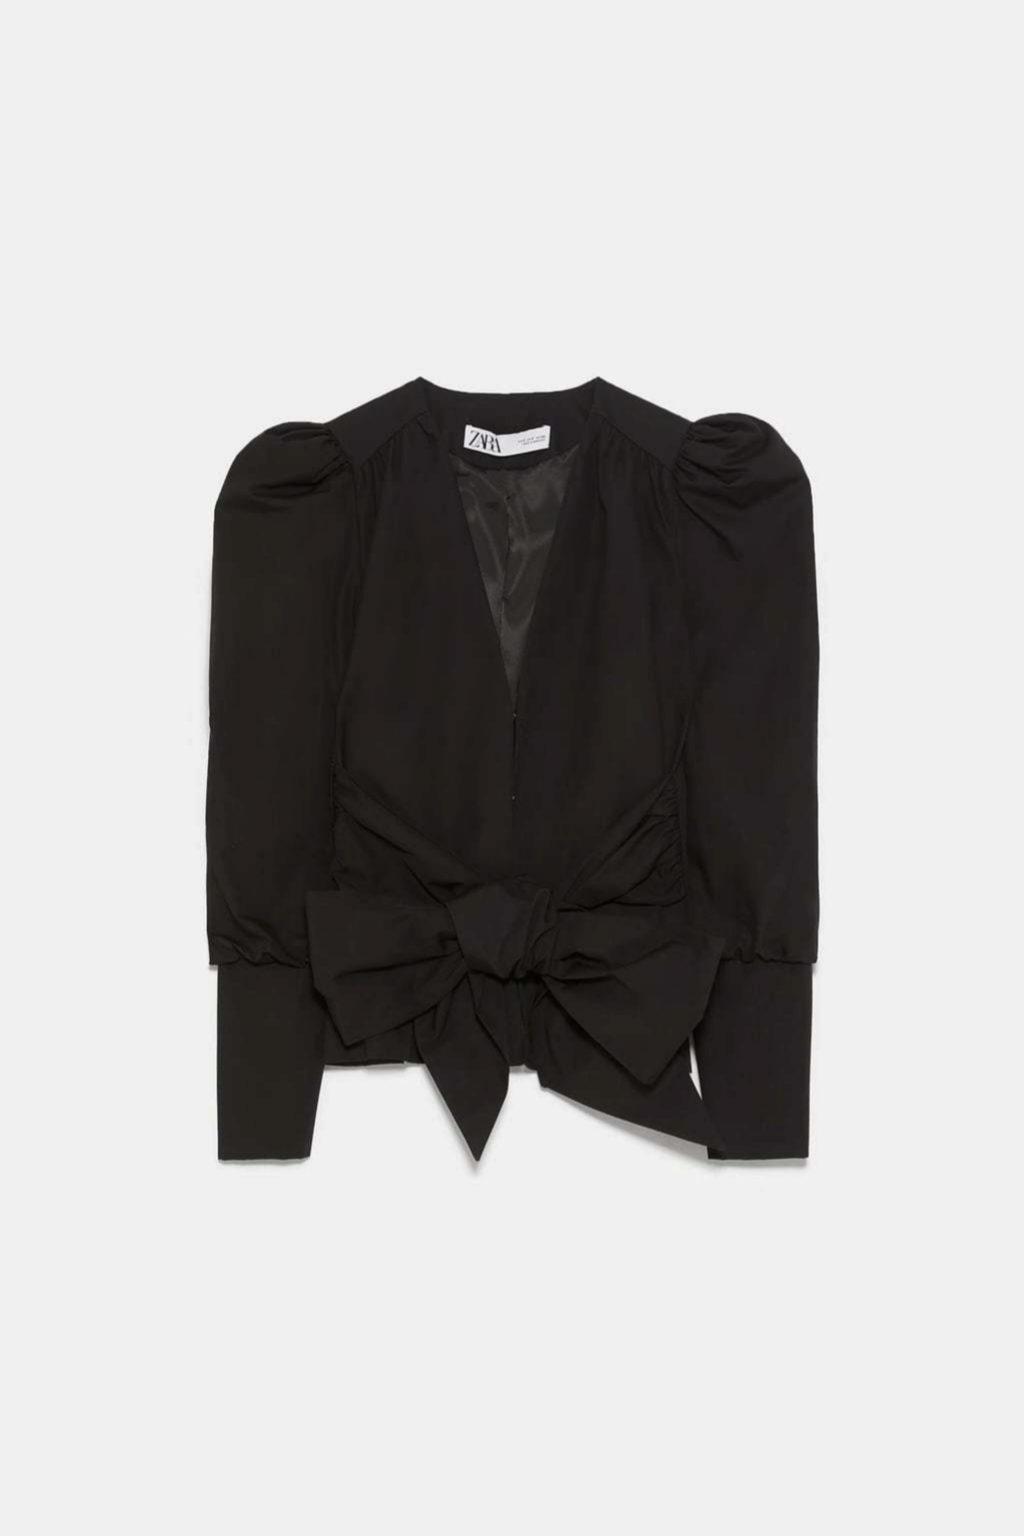 Top de manga larga en lino con lazo en la cintura de Zara